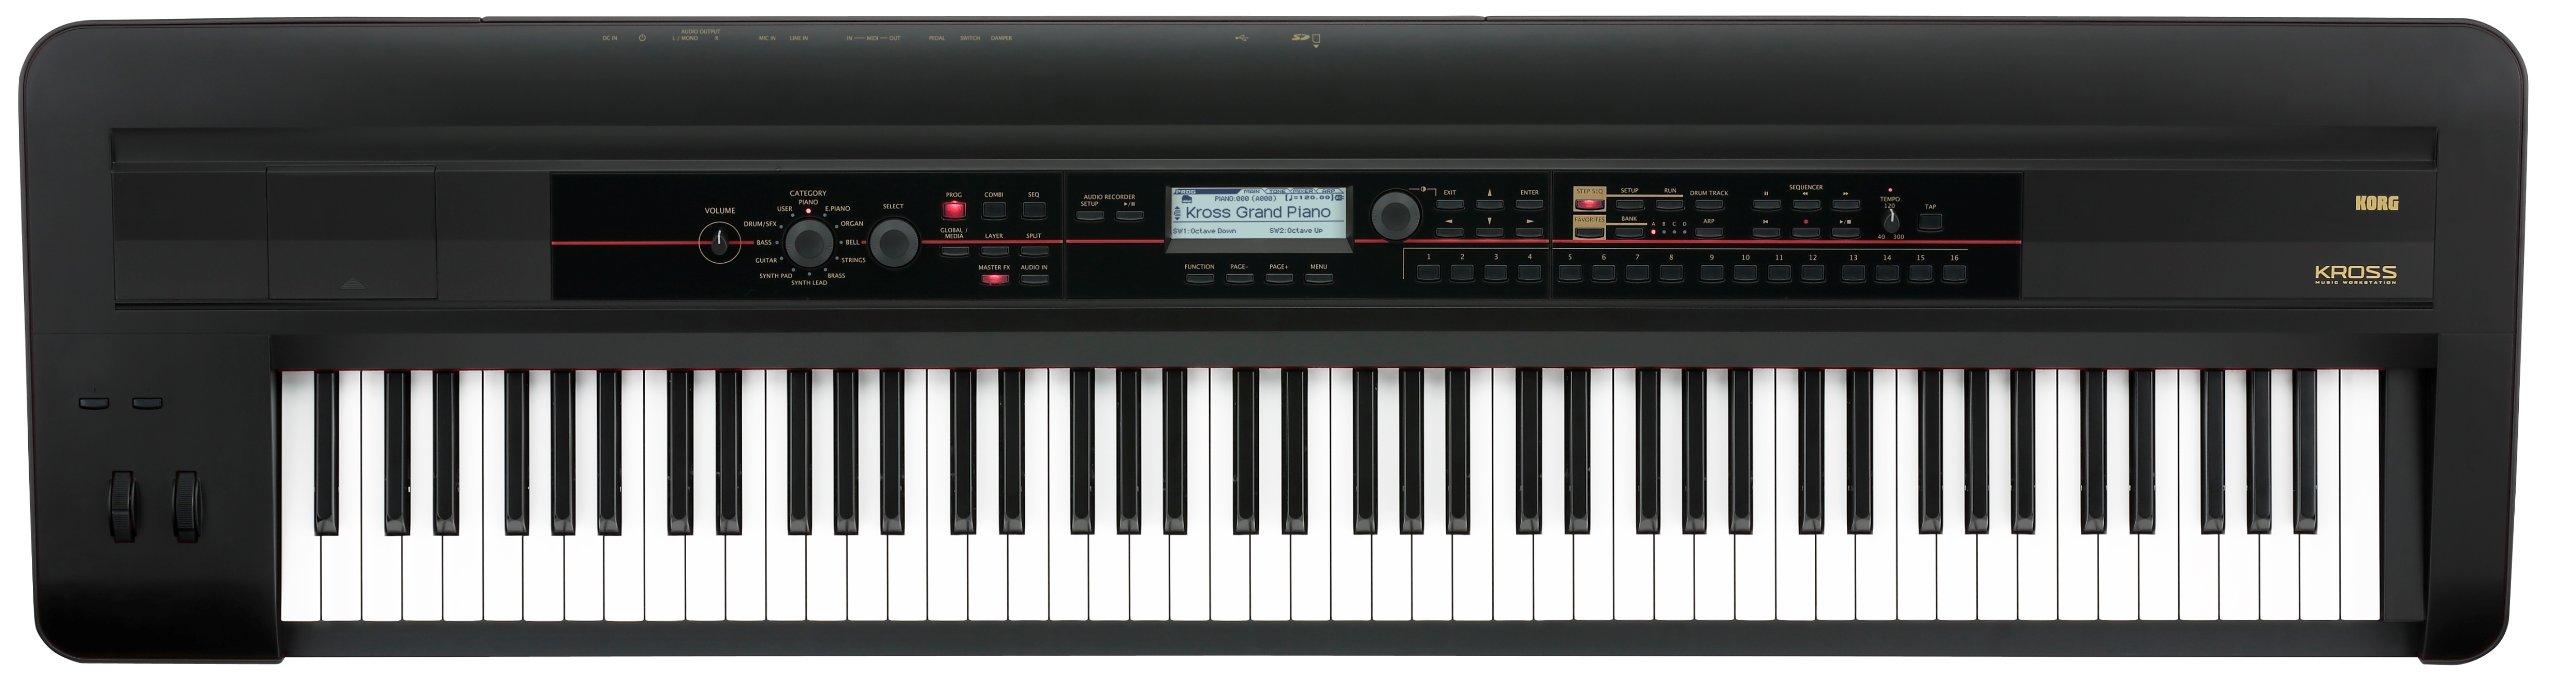 Korg KROSS 88 - Key Black Keyboard Production Station by Korg